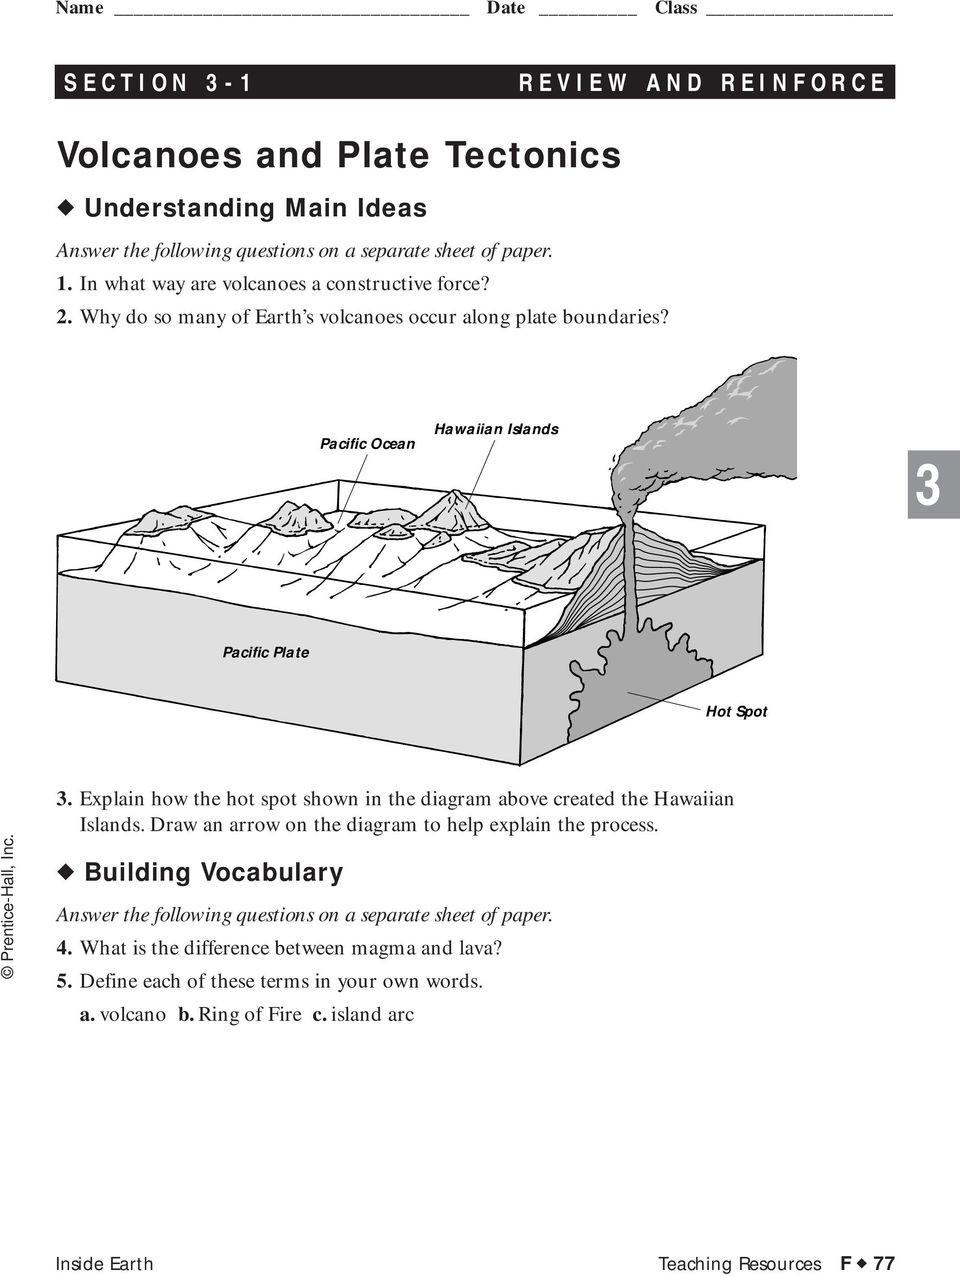 Plate Tectonics Worksheet Answer Key